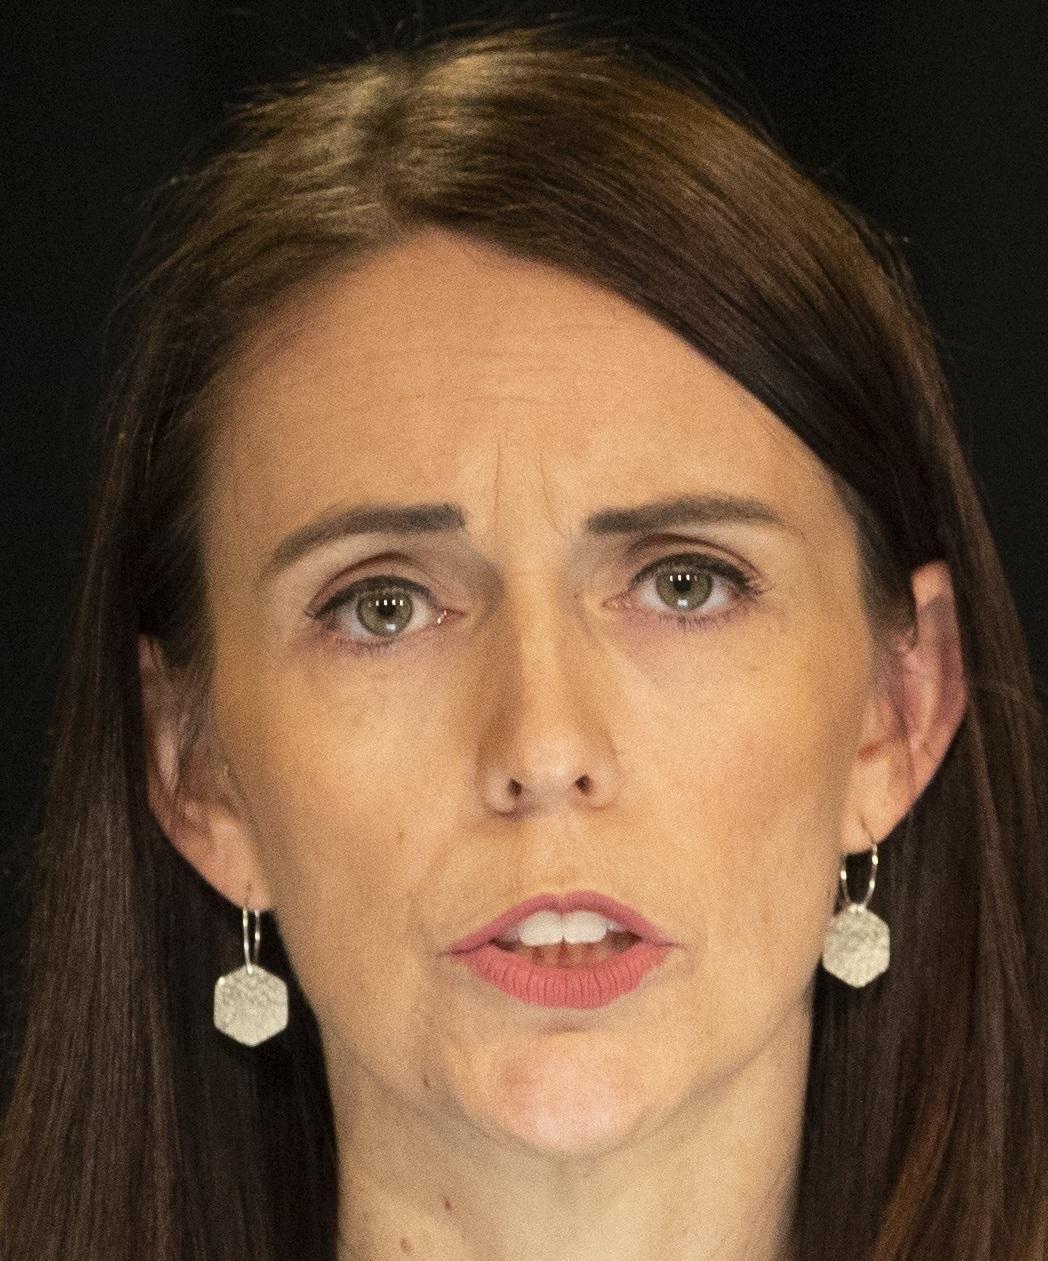 Govt not bullied: Ardern